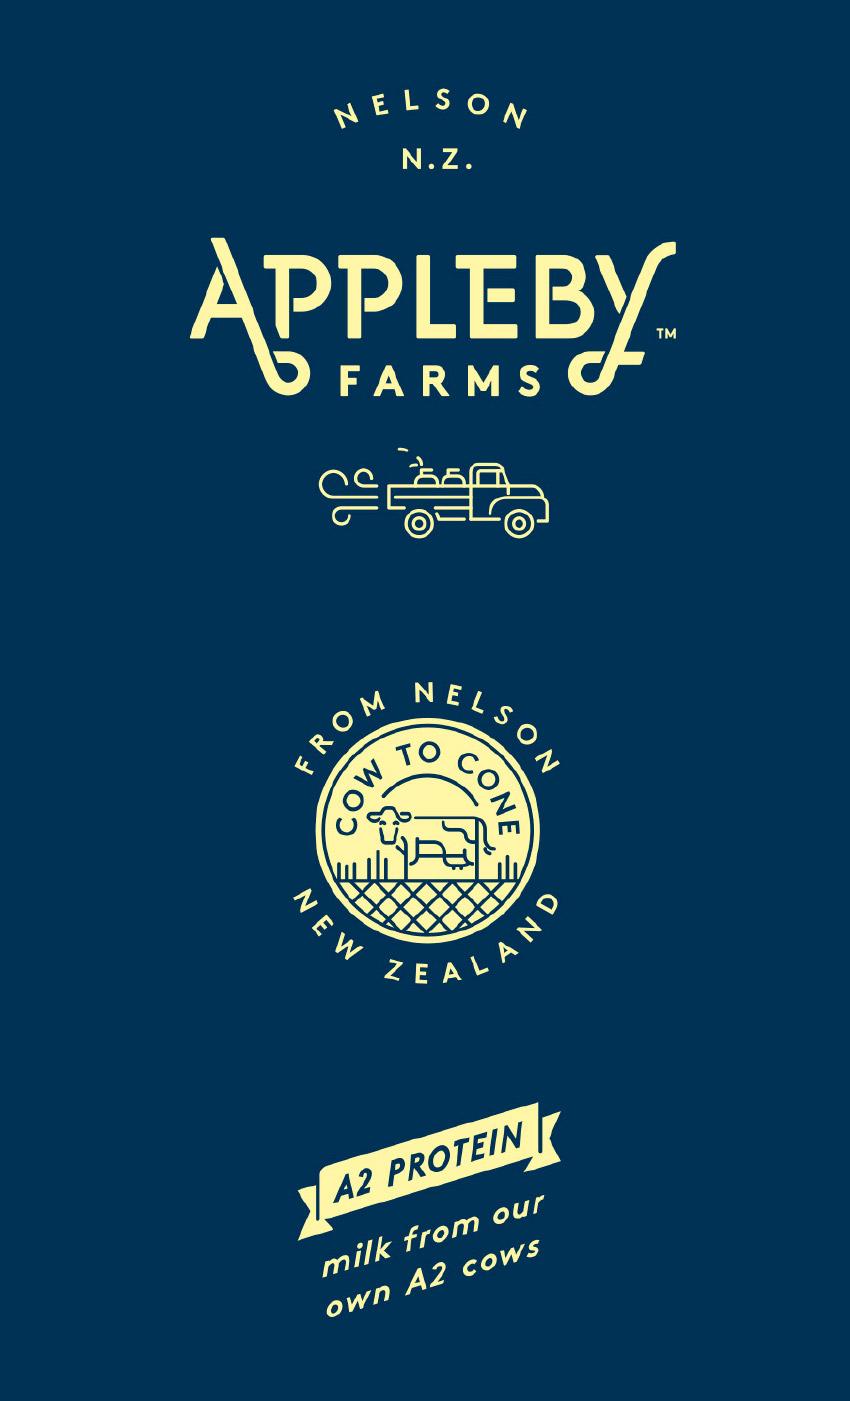 appleby-grid-01.jpg